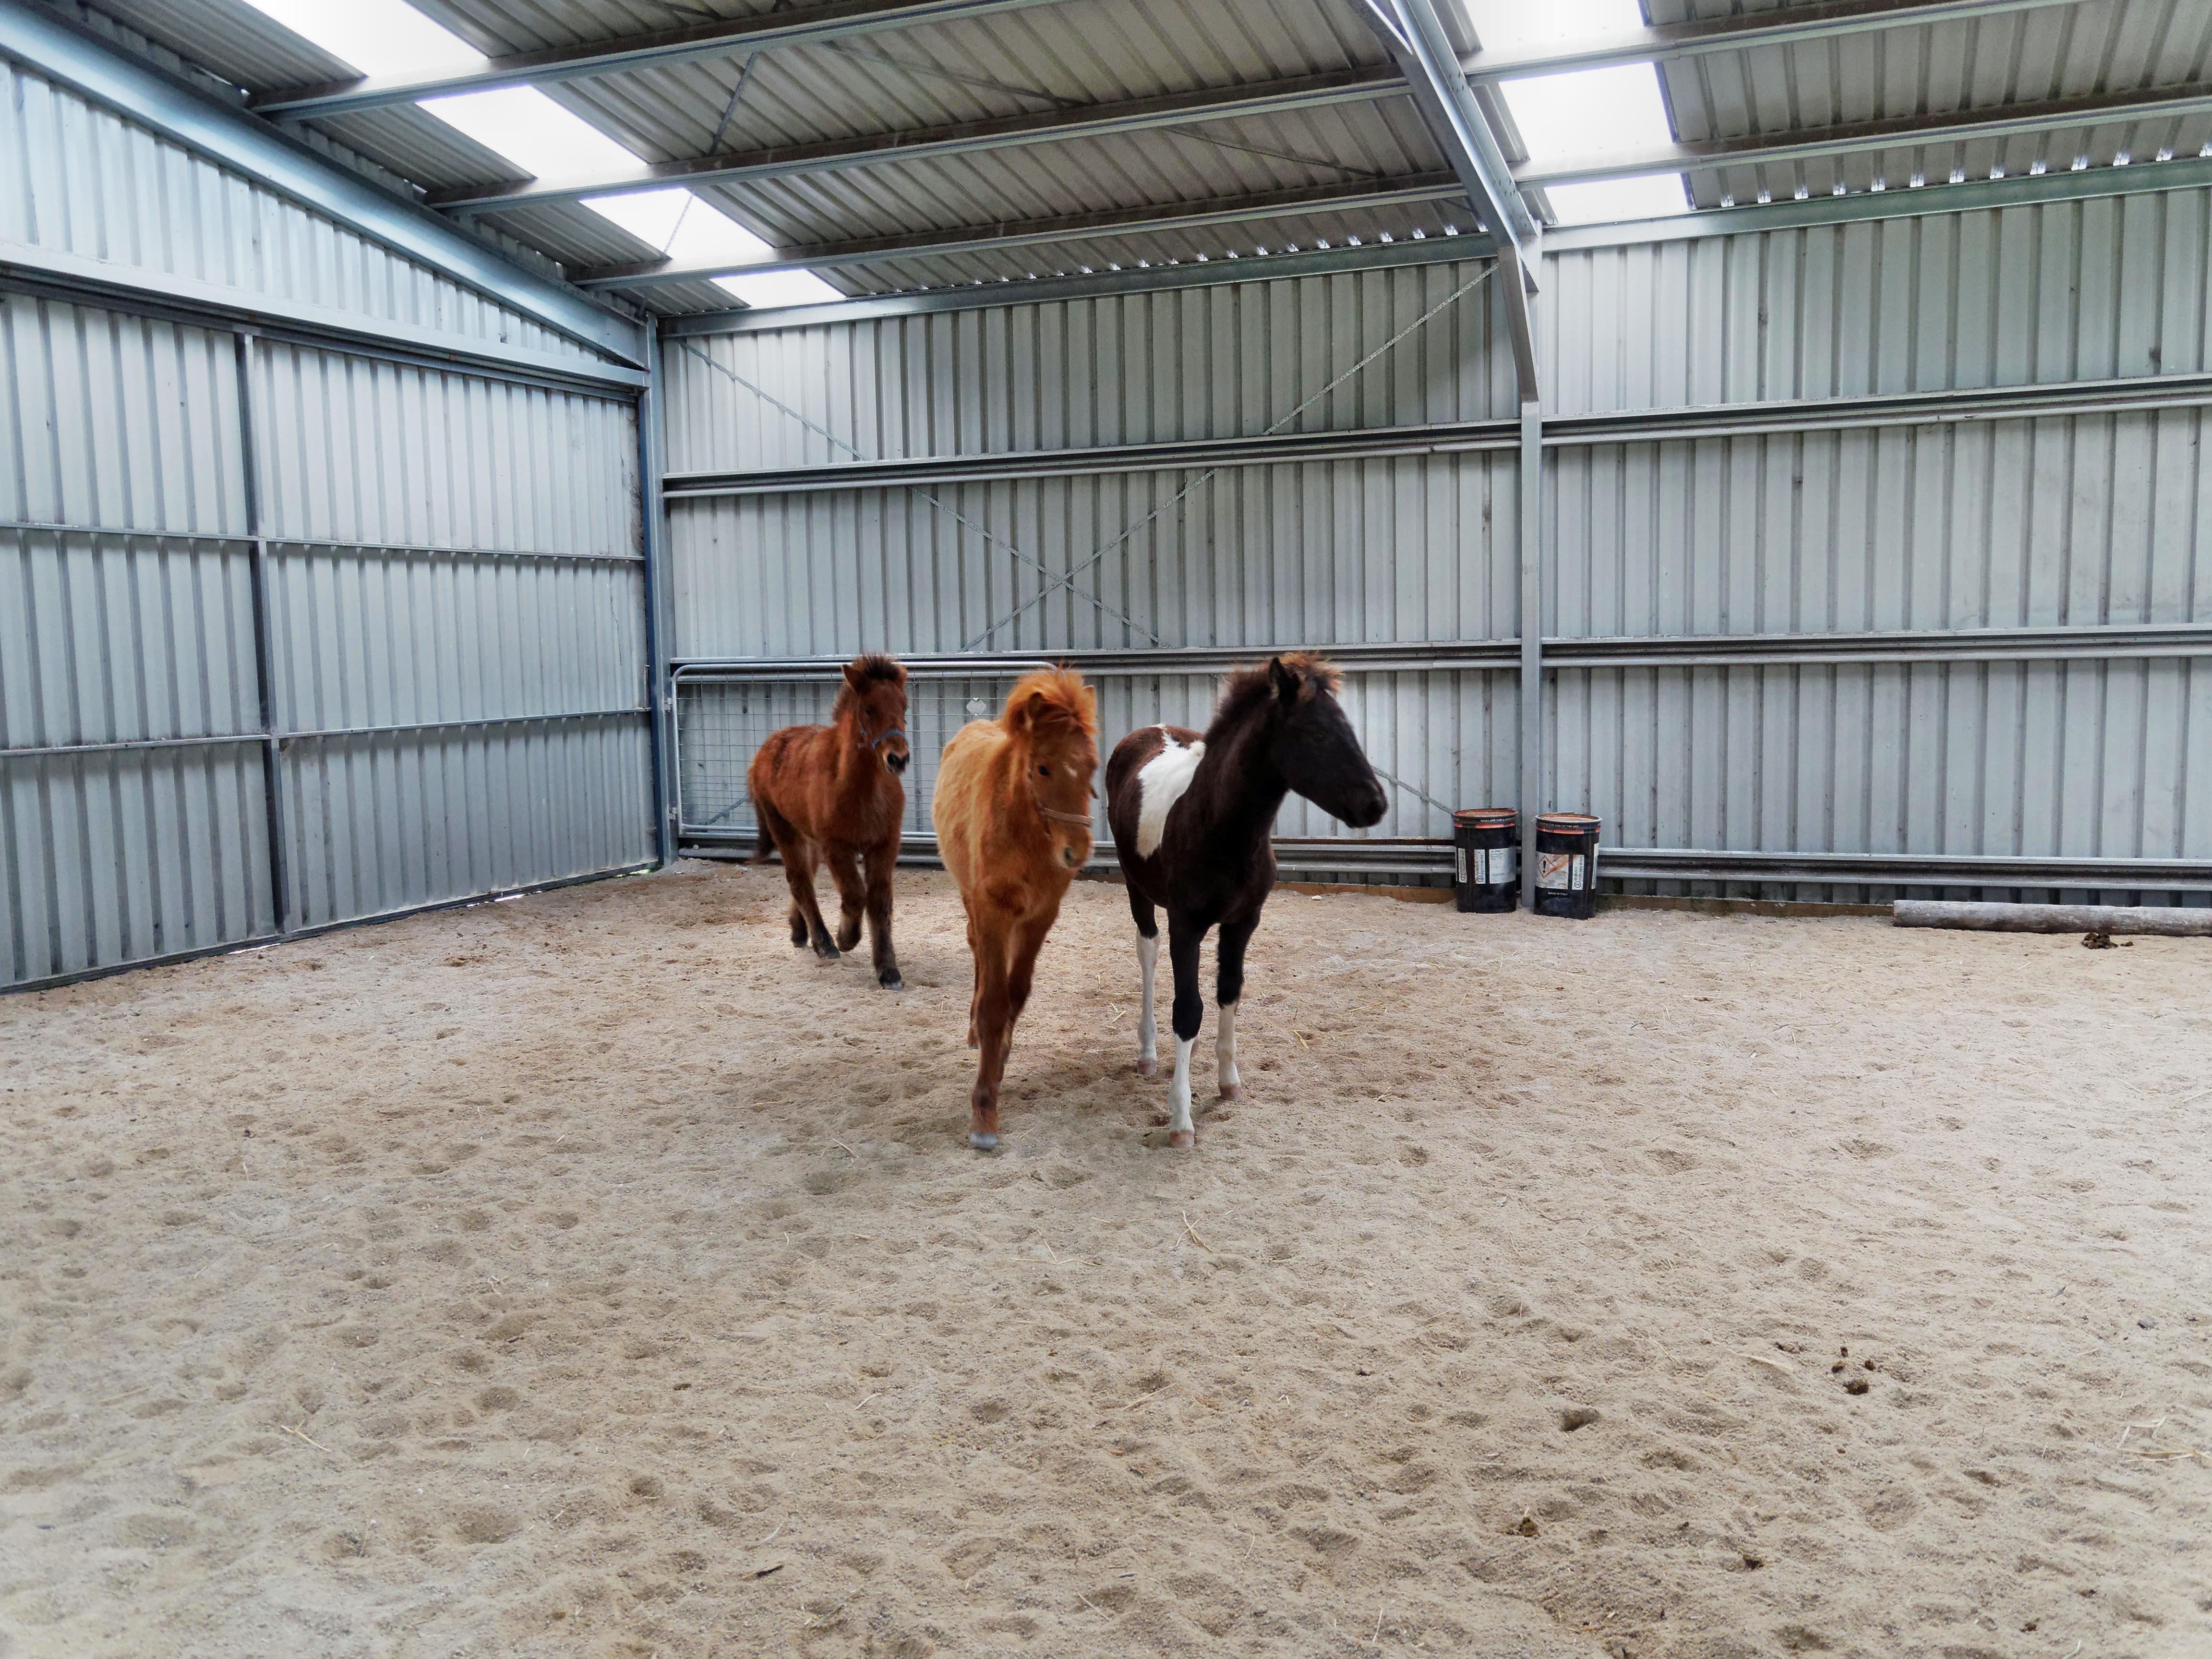 Horses-28.jpeg